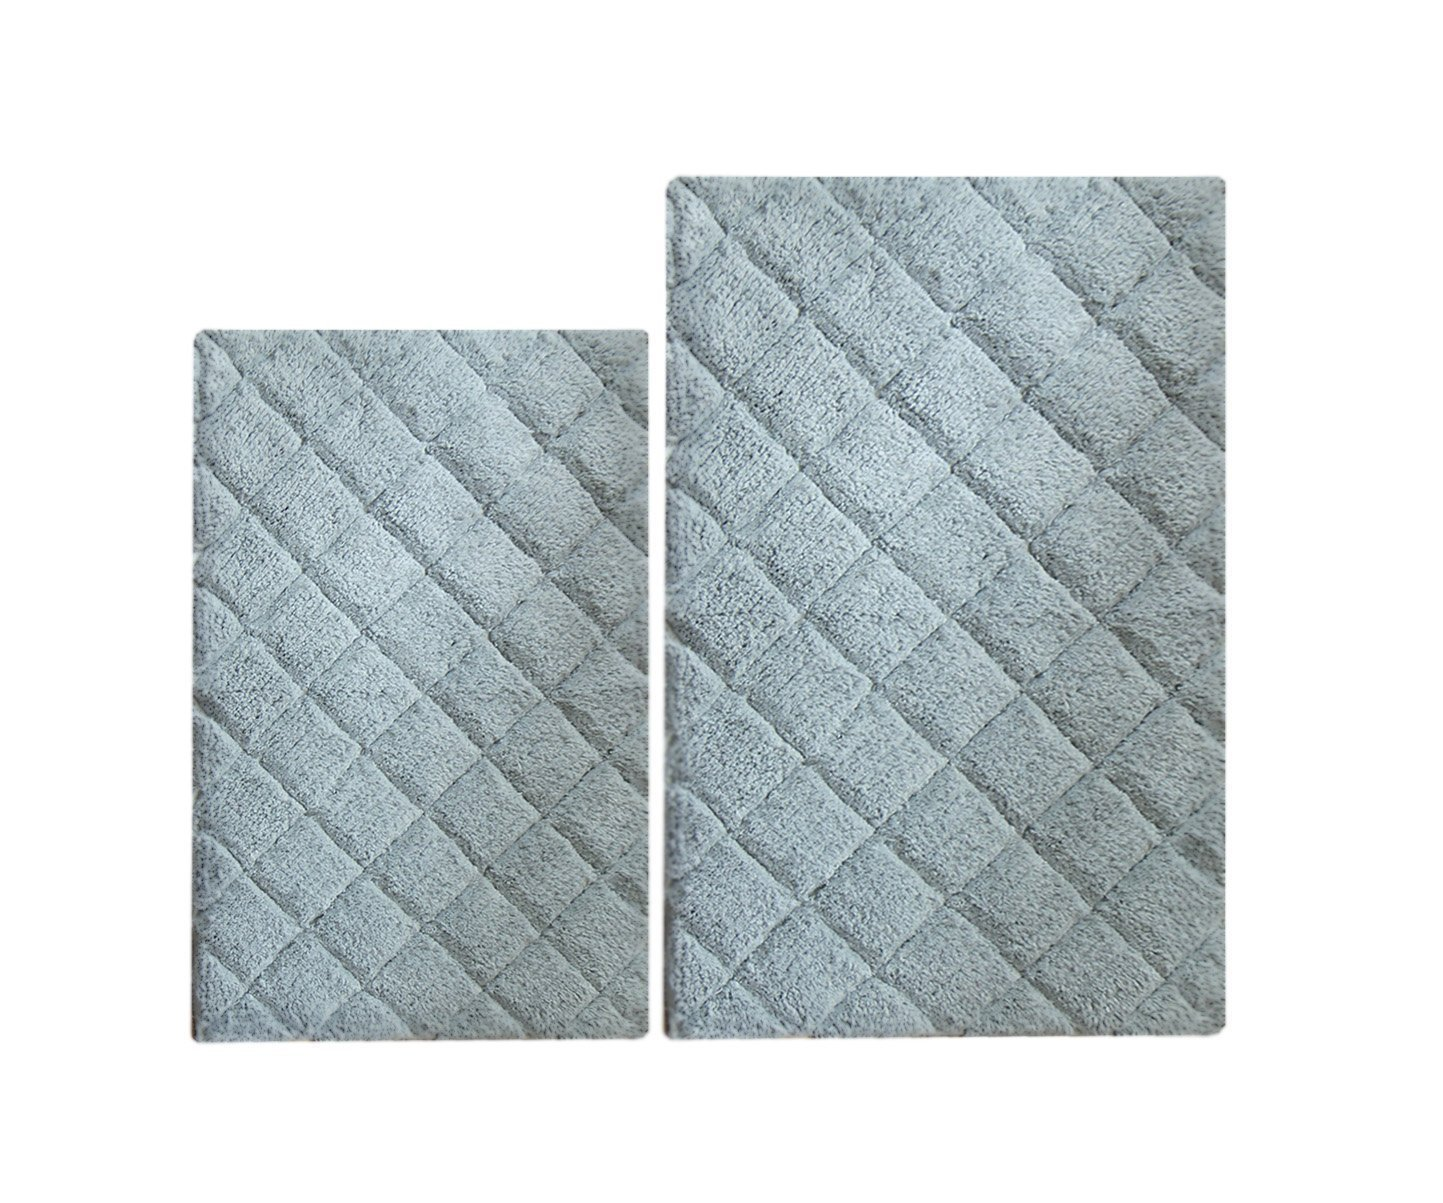 Chardin home 100% Cotton 2 Piece Impression Bath Rug Set, (24''x40'' & 21''x34'') Lt Gray